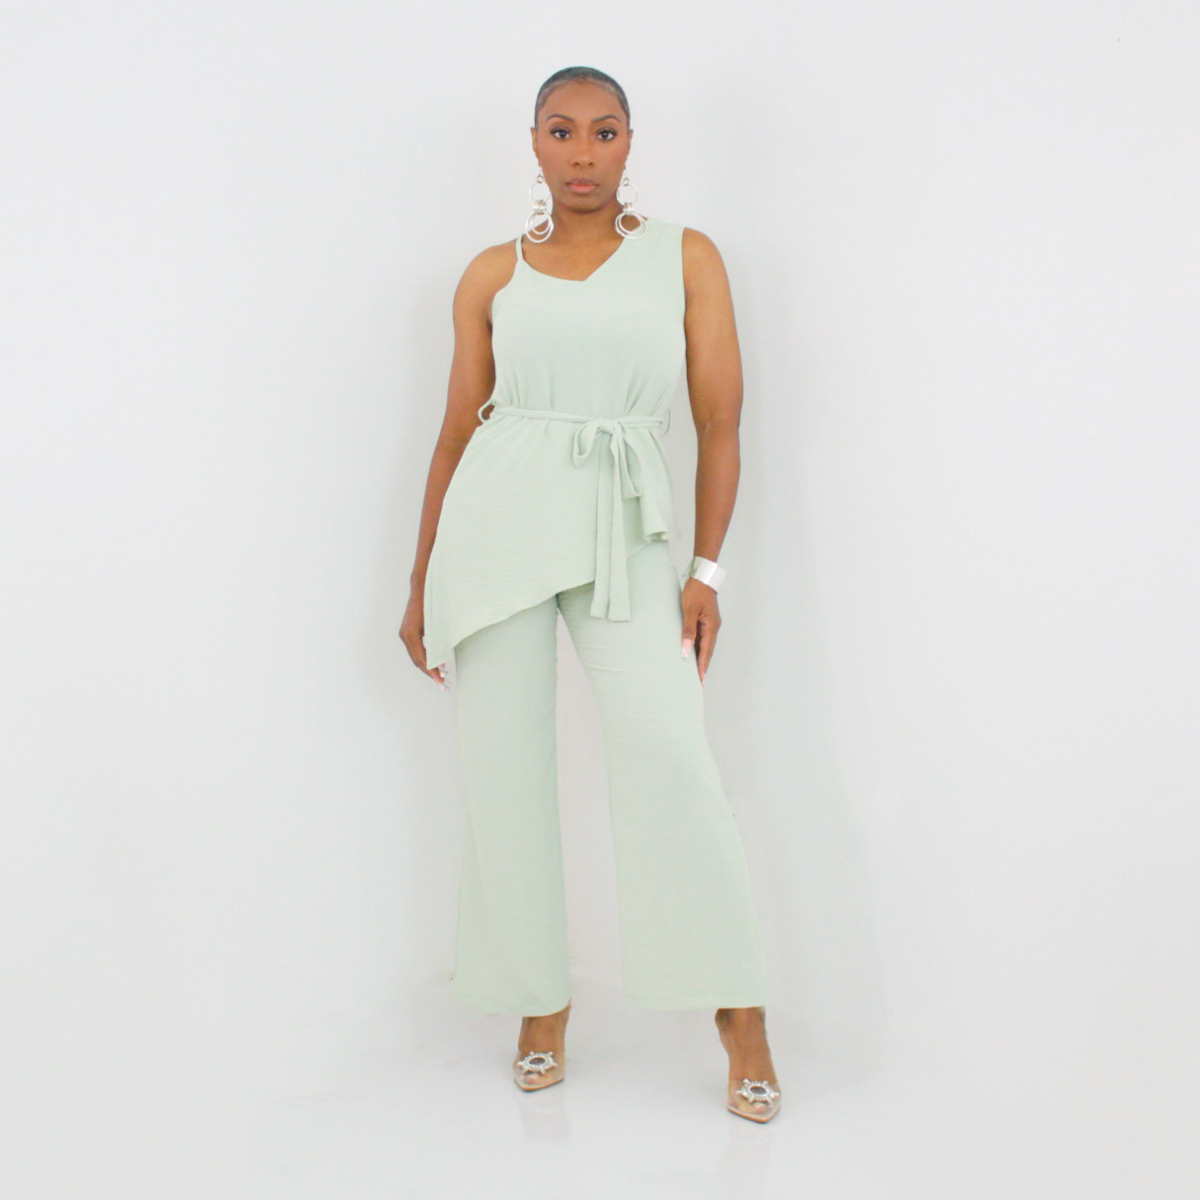 Ankle Dress Pant Set (Sage)